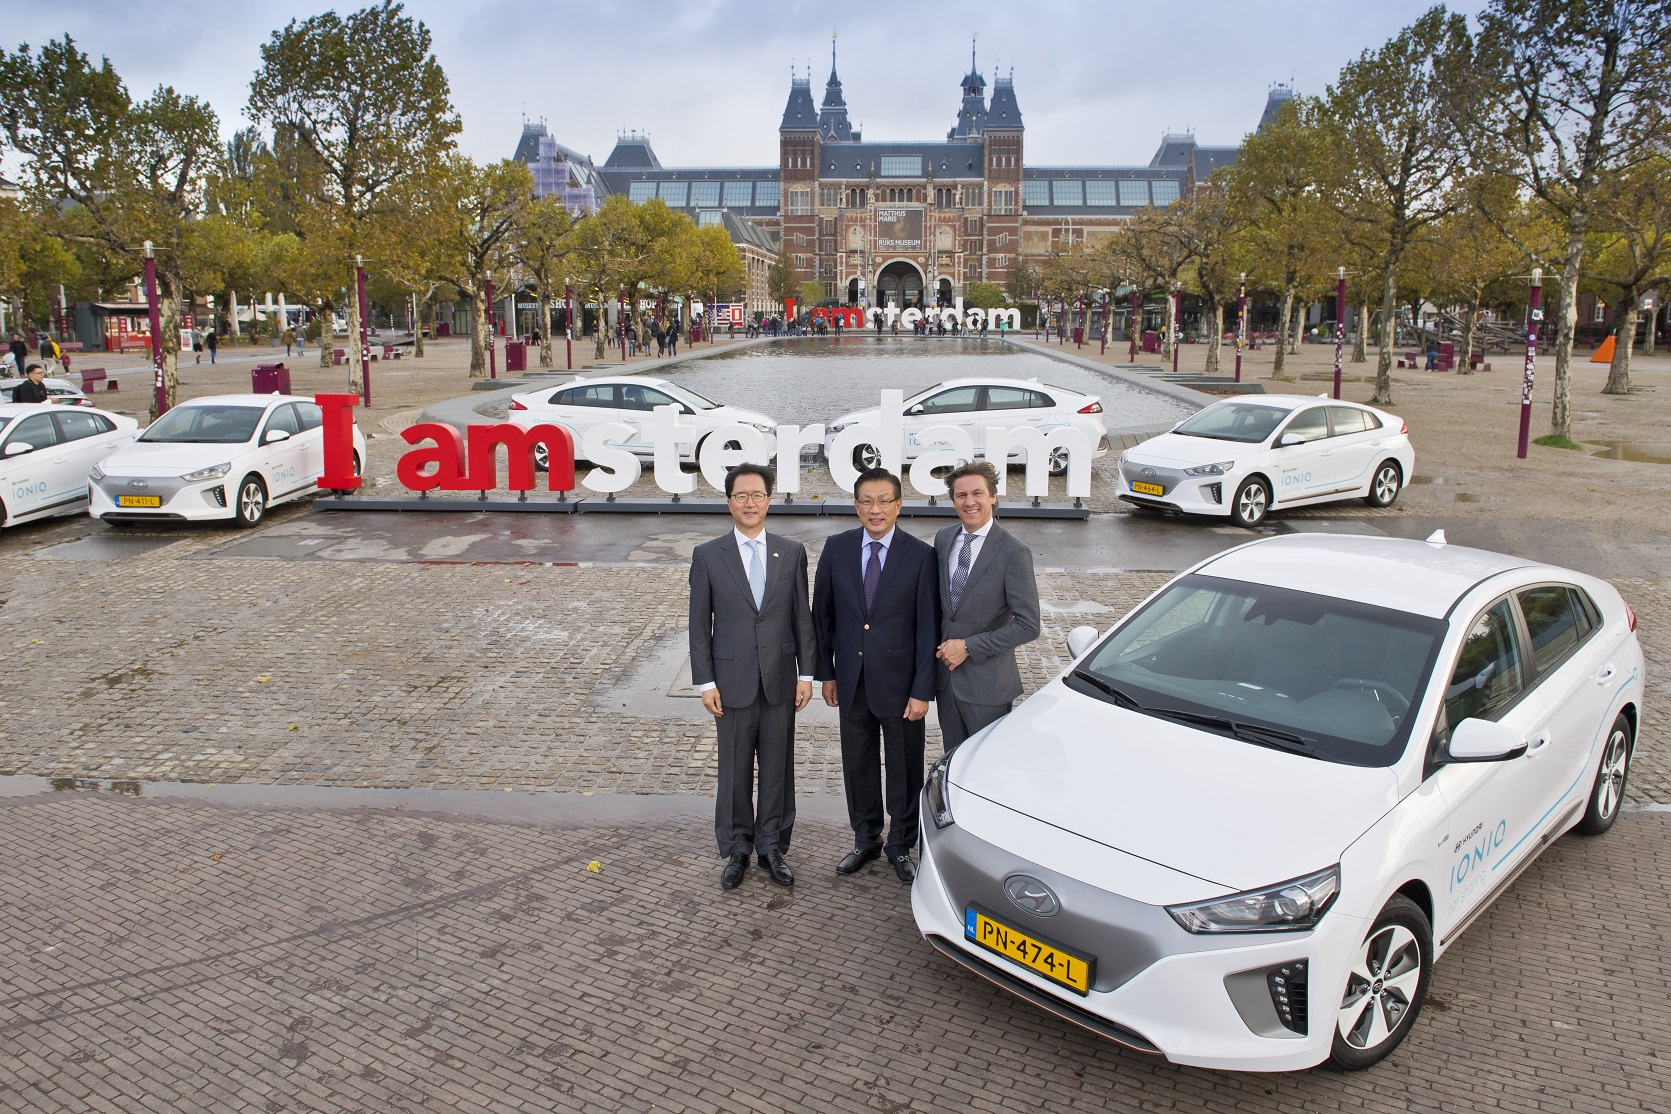 Hyundai Motor Launched EV Sharing Service in Amsterdam - 비즈니스